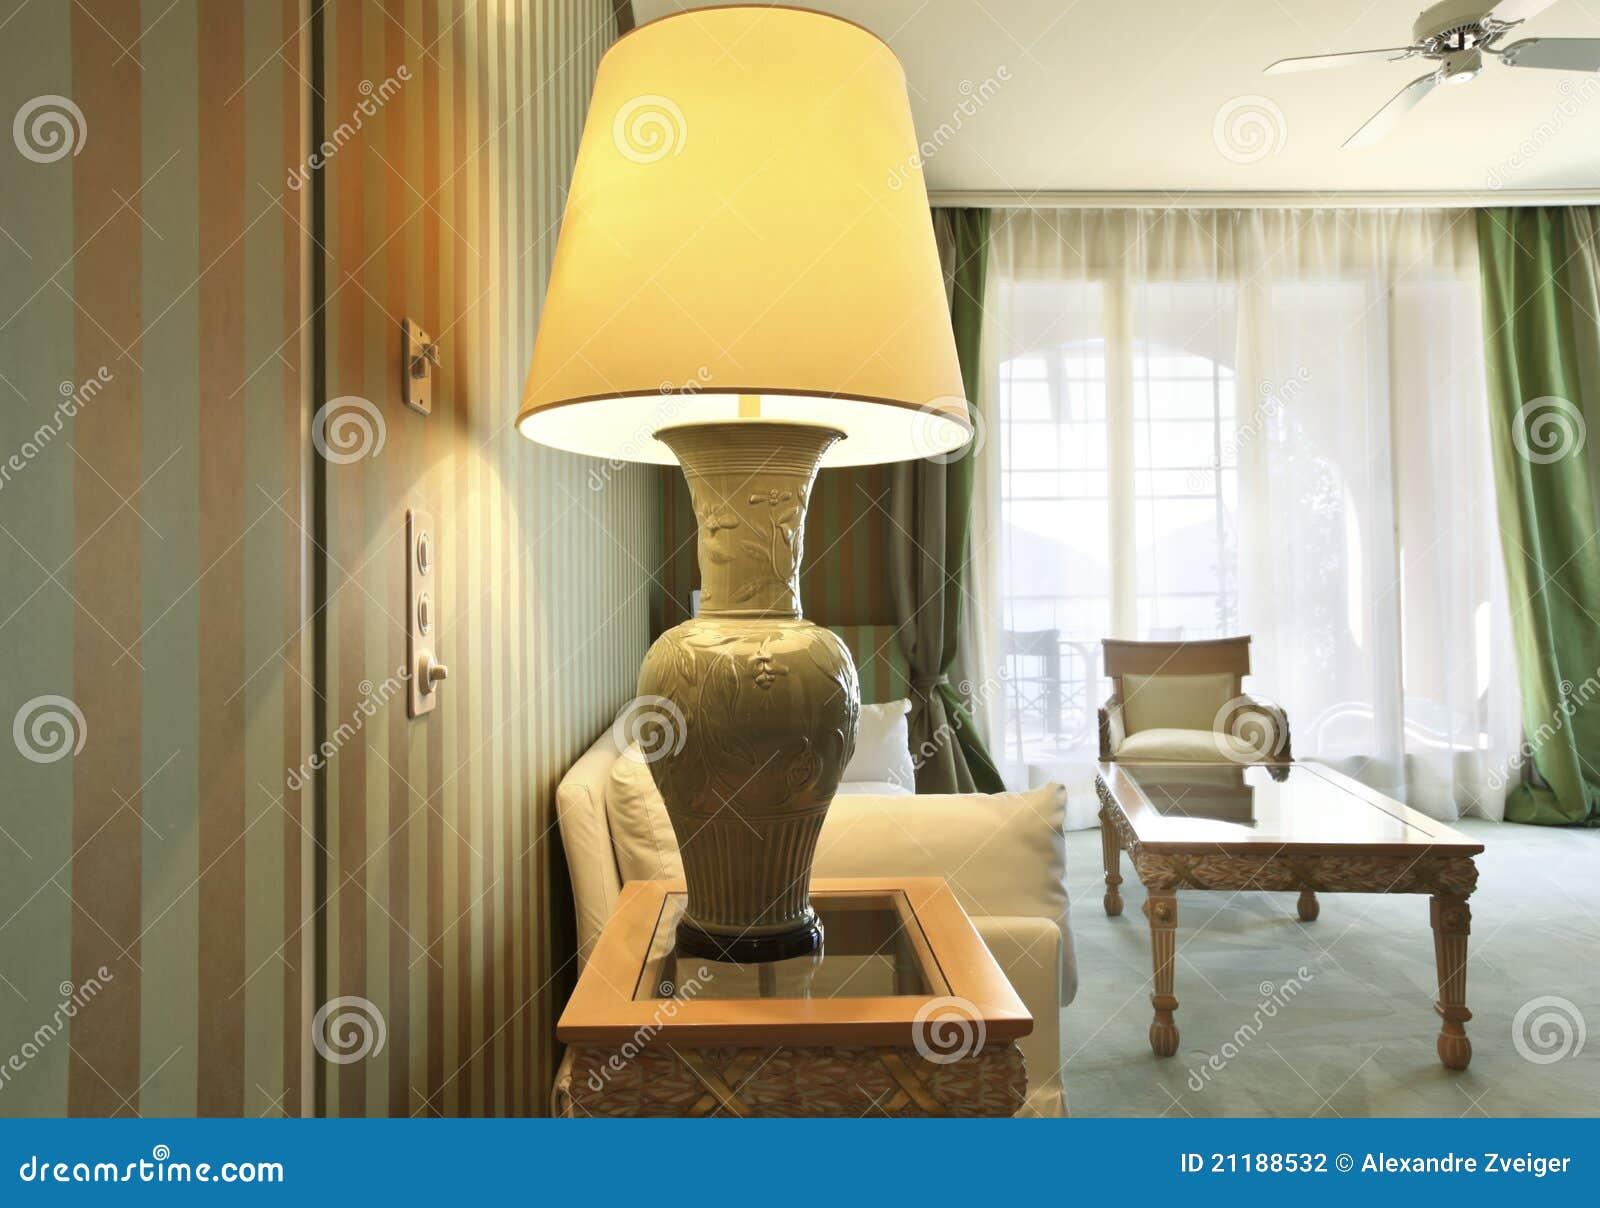 Comfortable suit, closeup table lamp